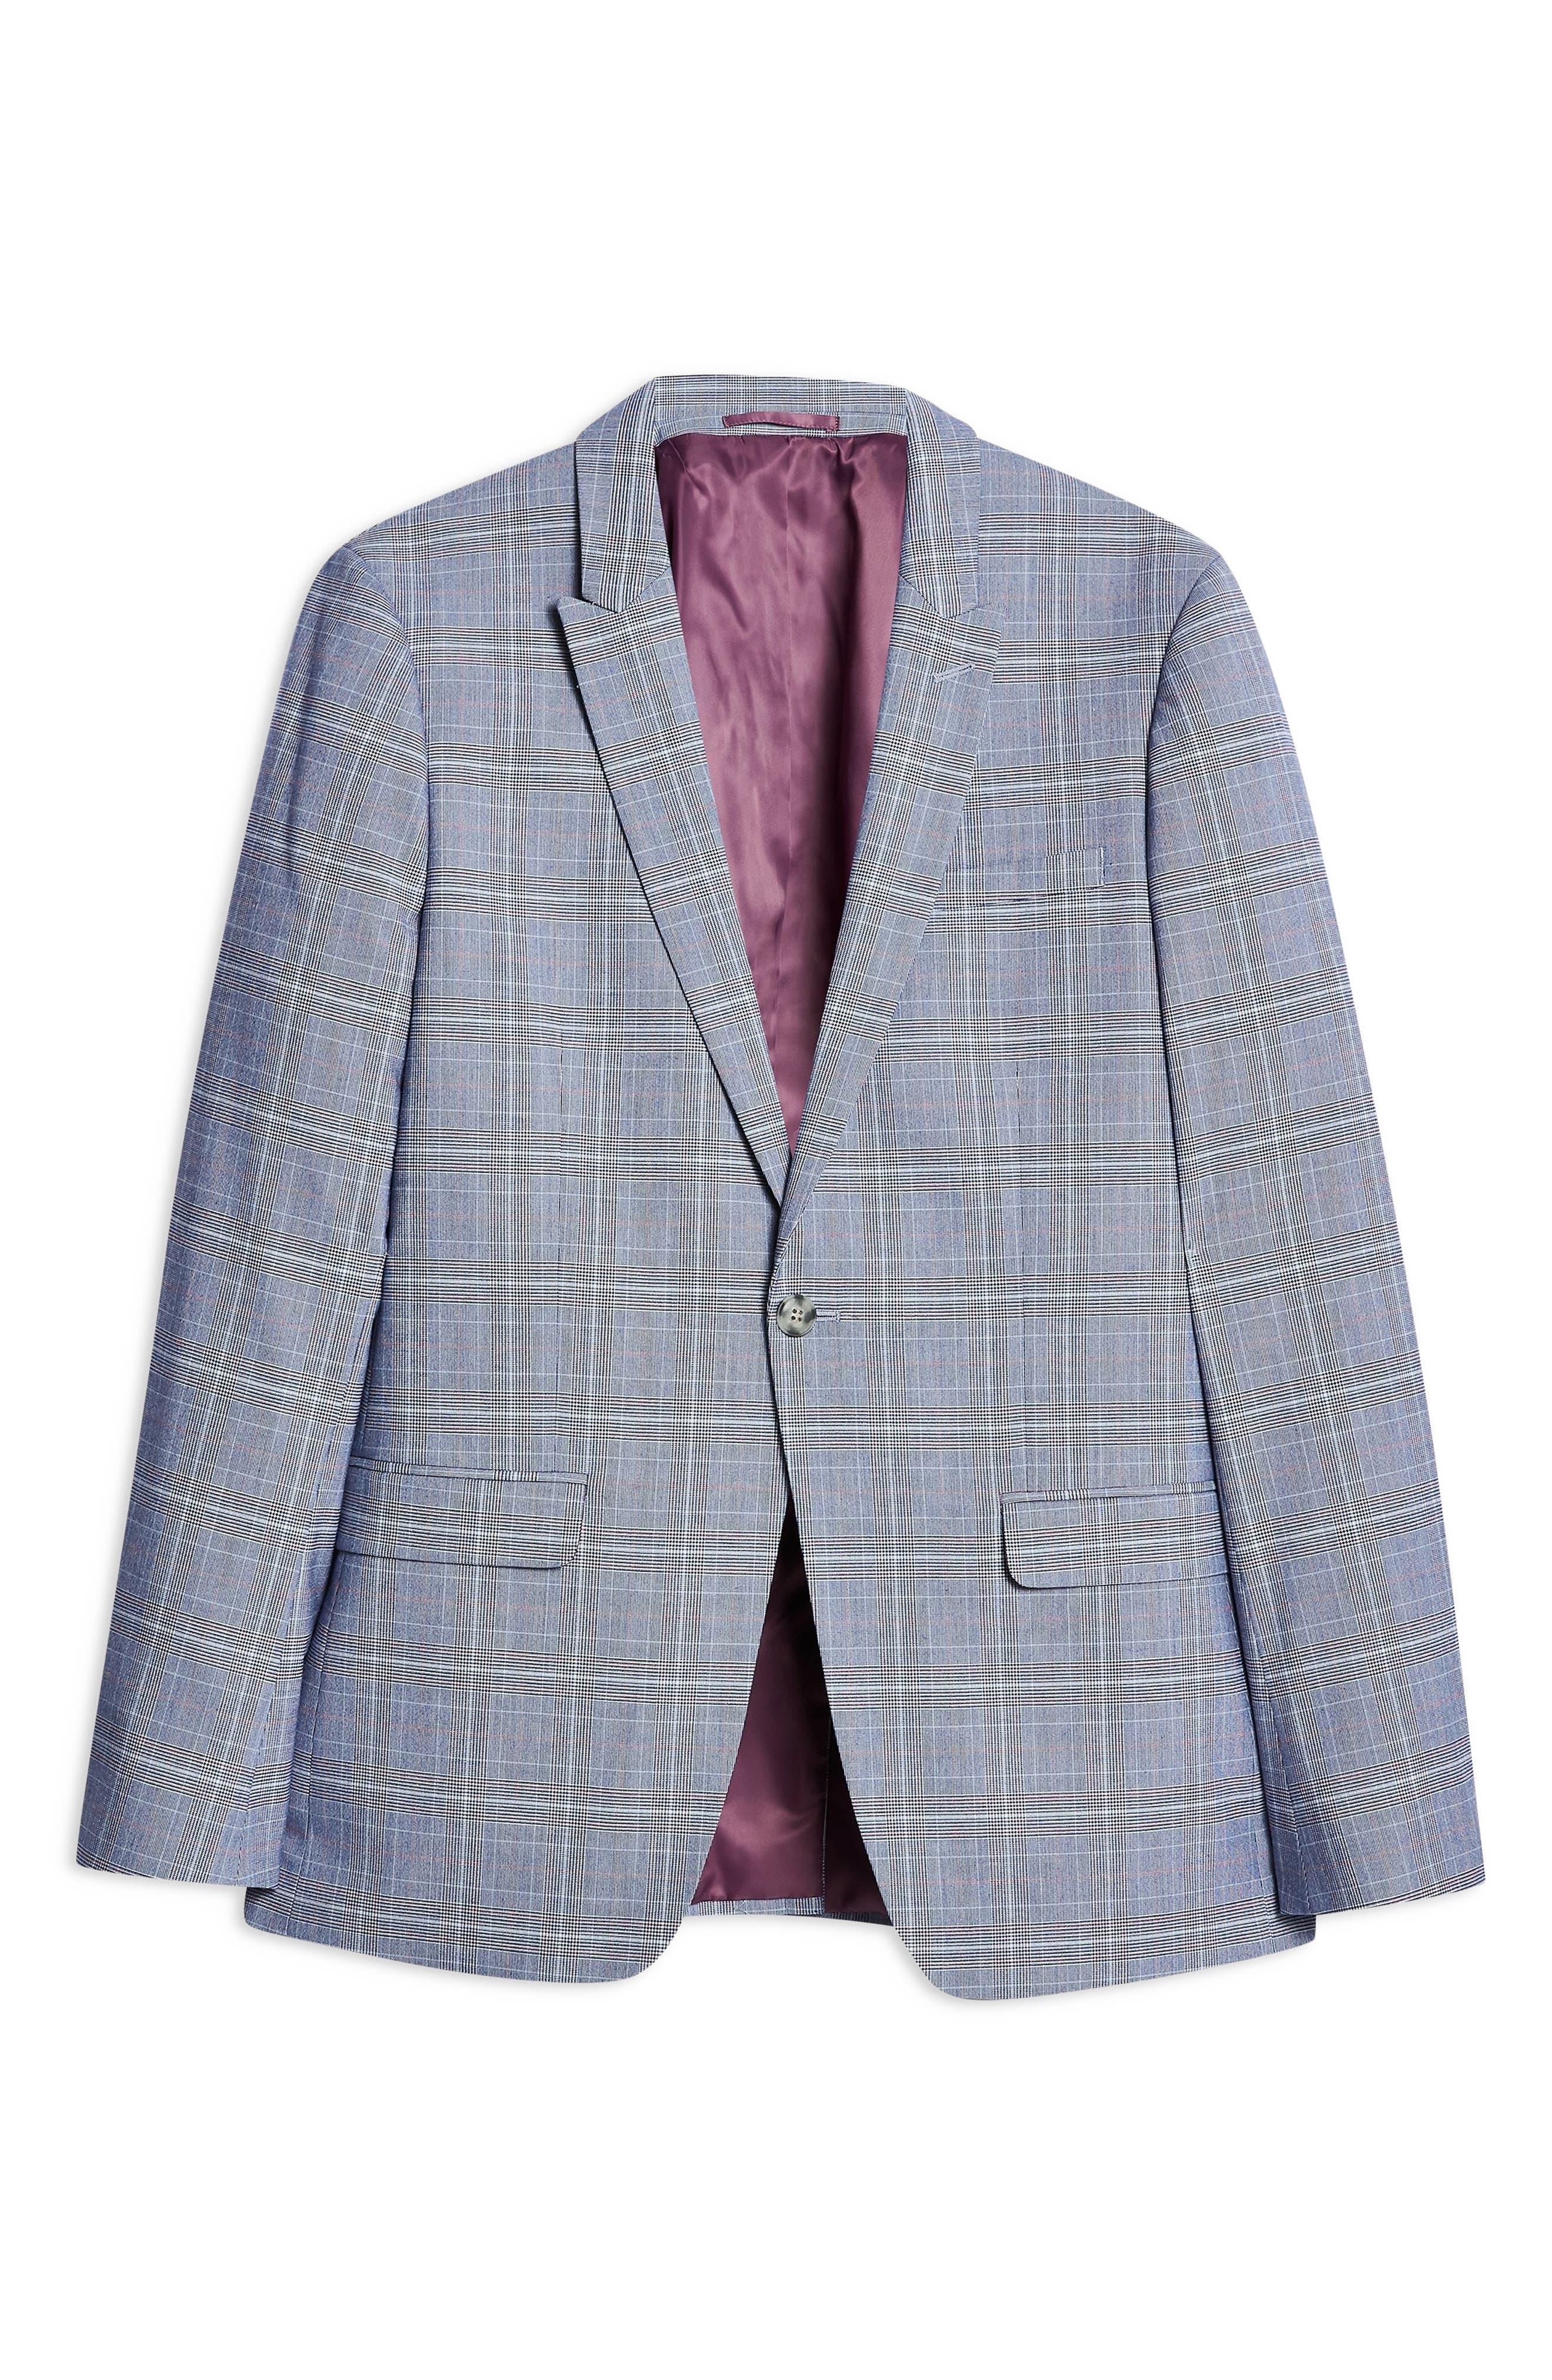 TOPMAN, Skinny Fit Suit Jacket, Alternate thumbnail 4, color, BLUE MULTI